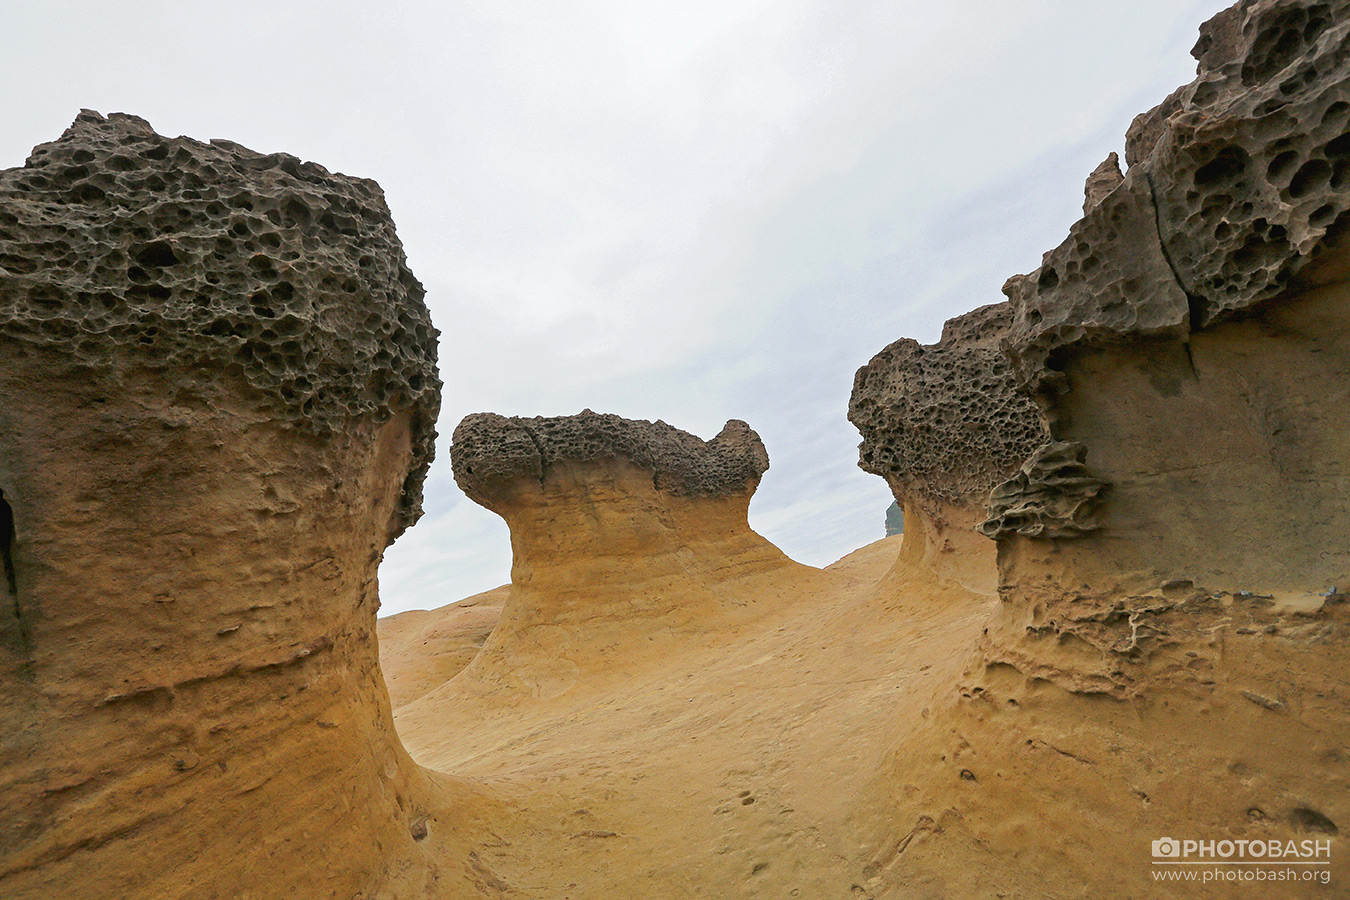 Porous-Rocks-Weird-Formations.jpg